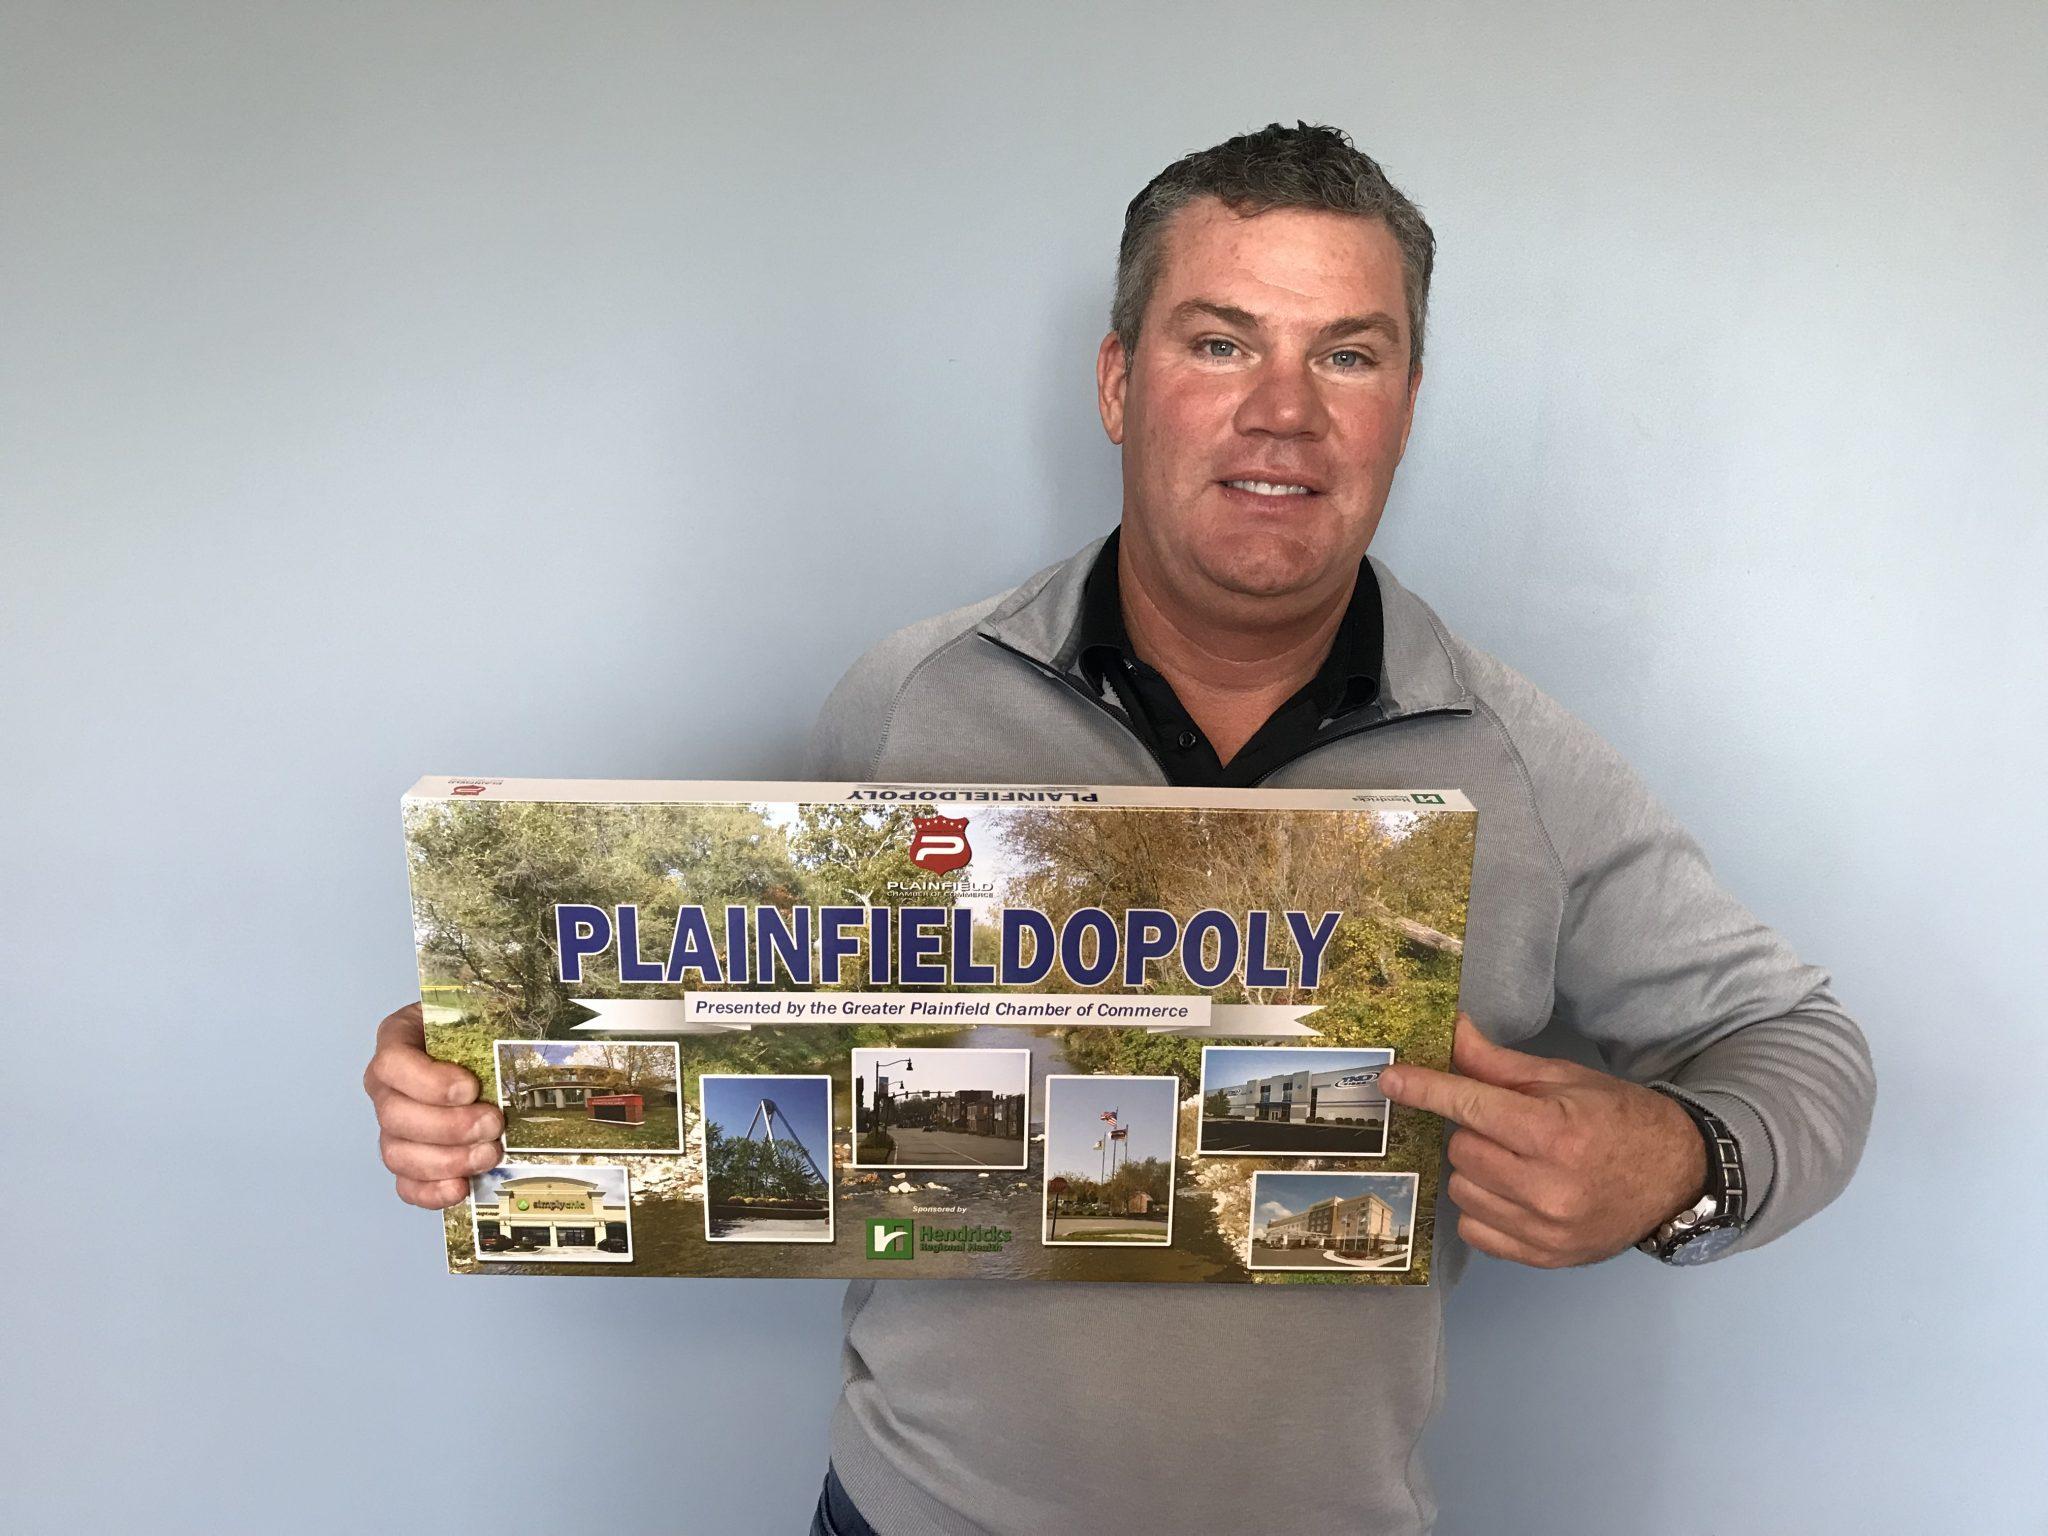 Plainfieldopoly